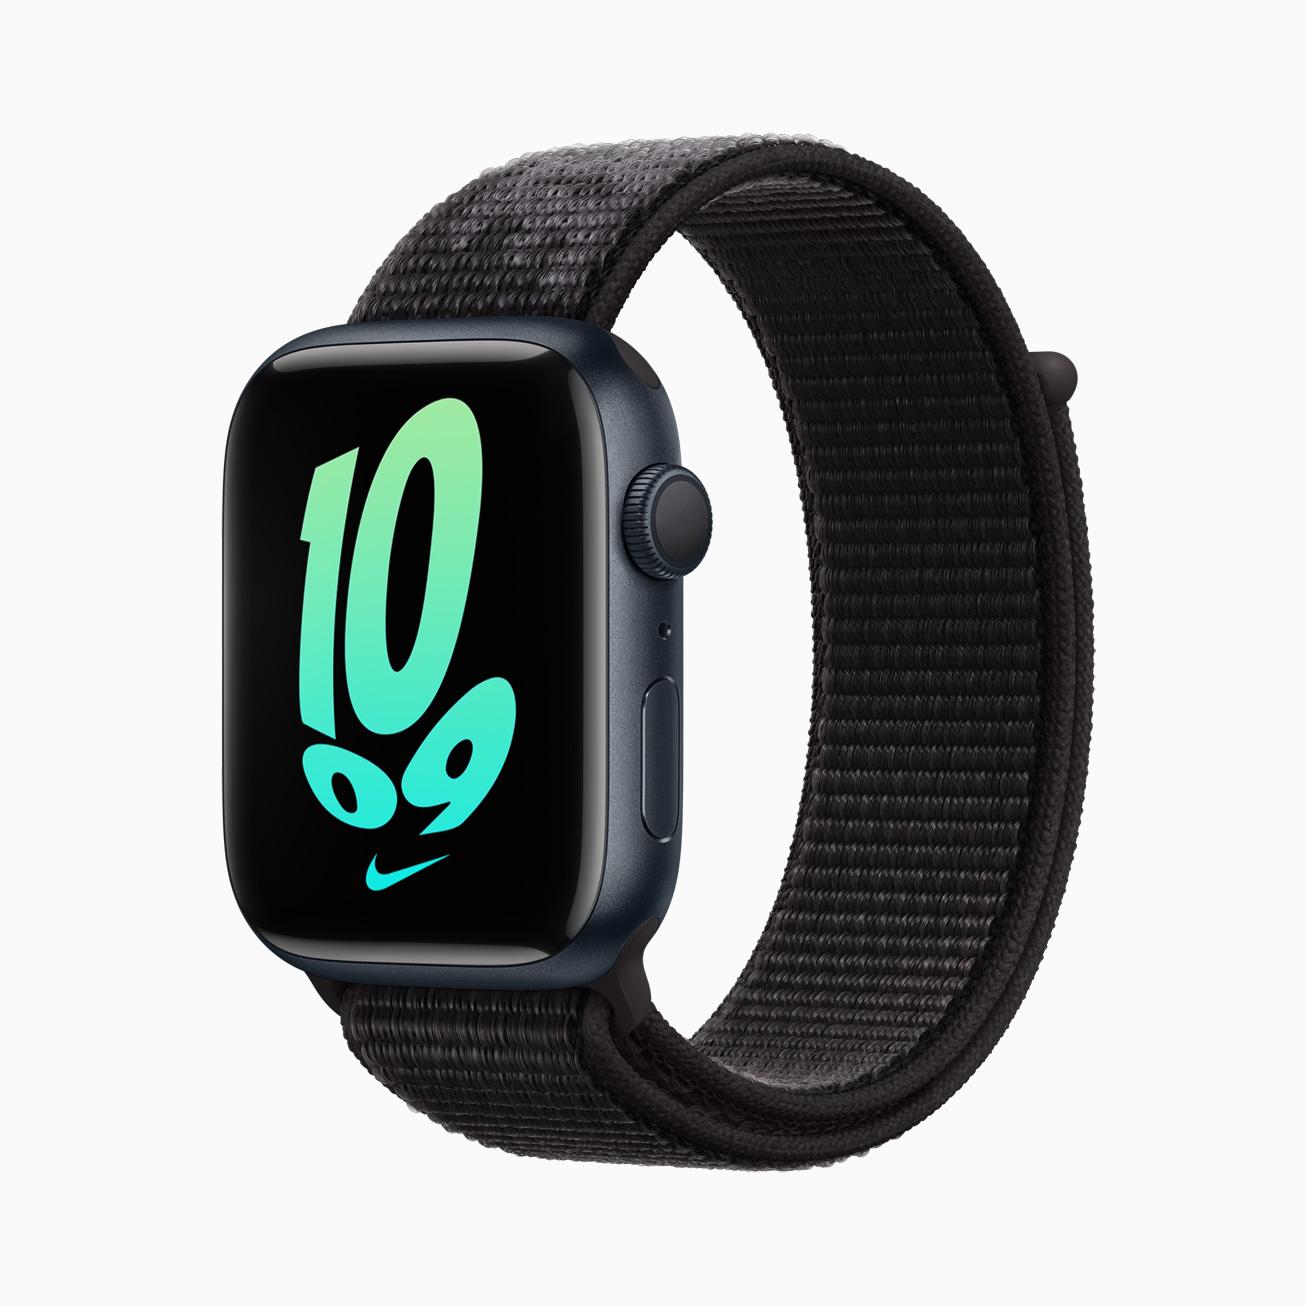 ontop.vn Apple watch series7 nike 01 09142021